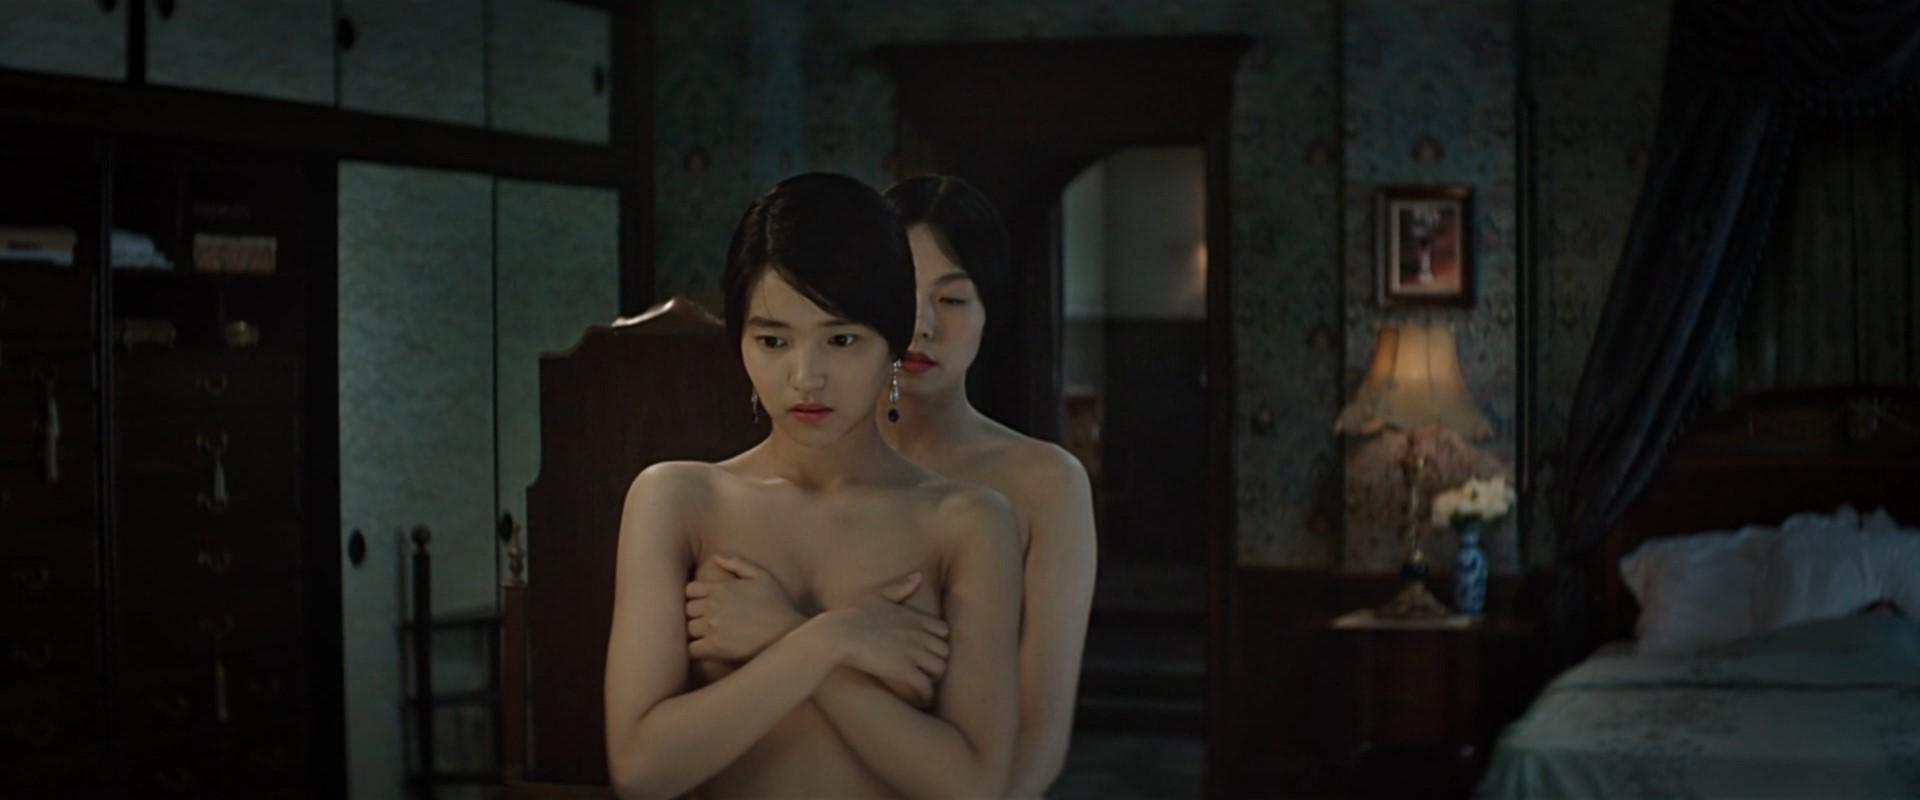 Naked hee photo sex tae kim